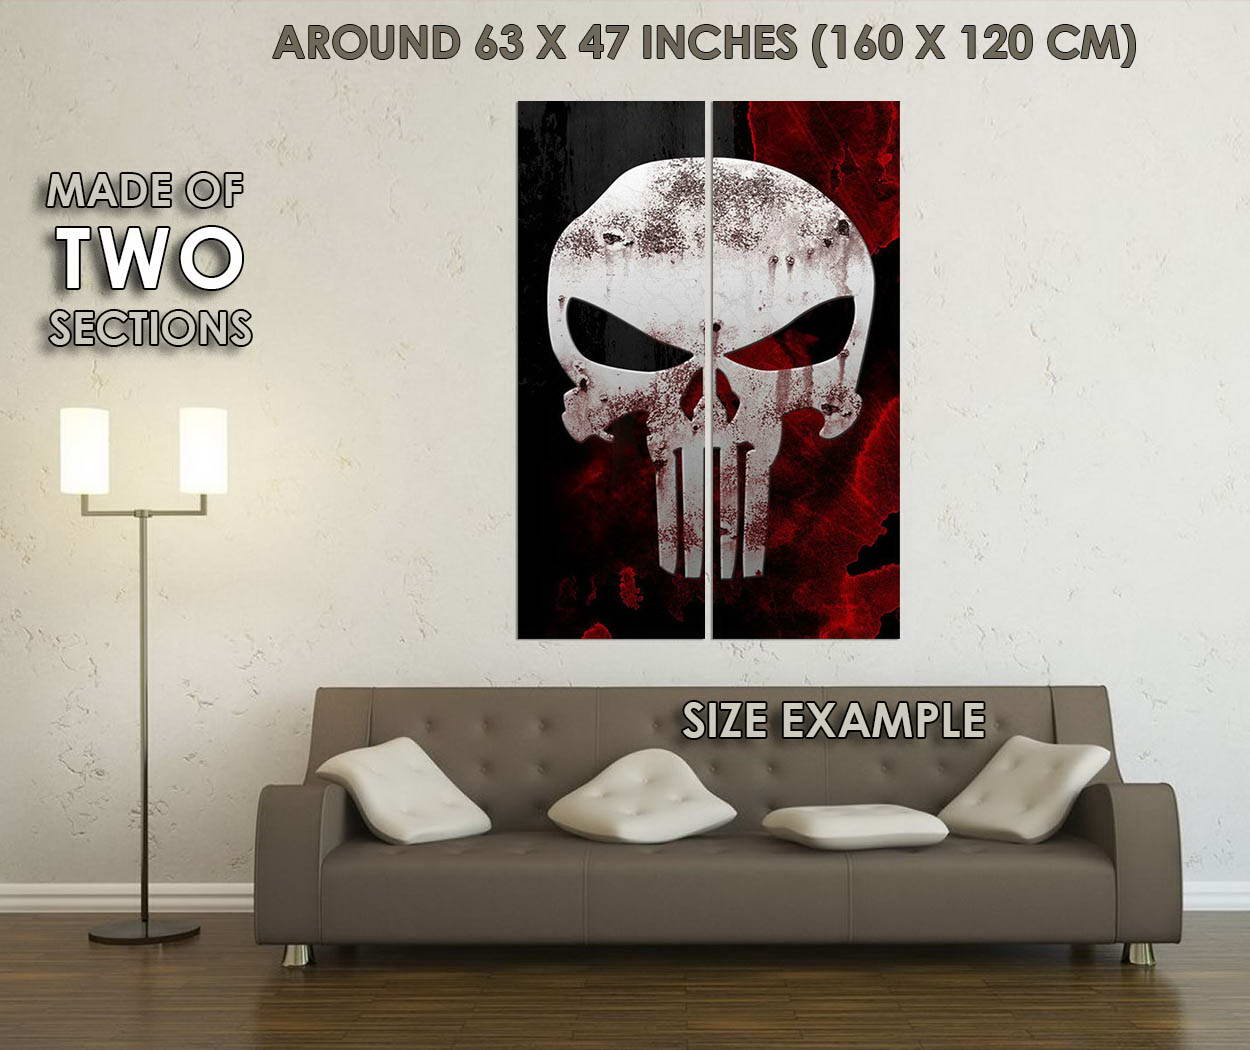 10695-The-Punisher-Skull-Superhero-Movie-LAMINATED-POSTER-CA thumbnail 6